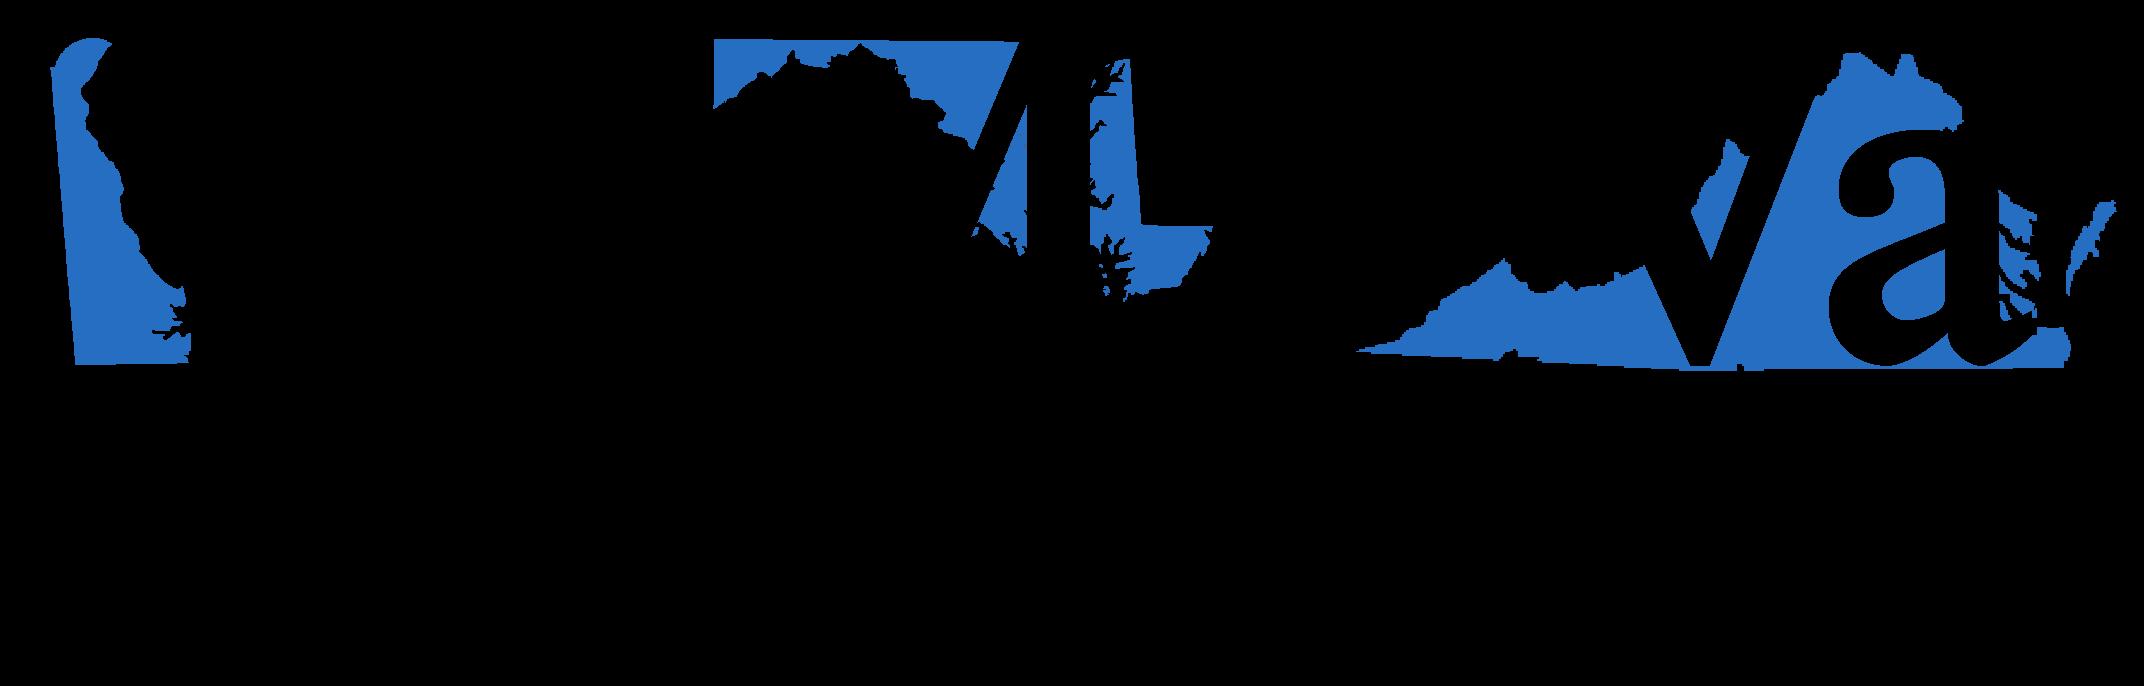 Delmarva Baptist Fellowship Logo